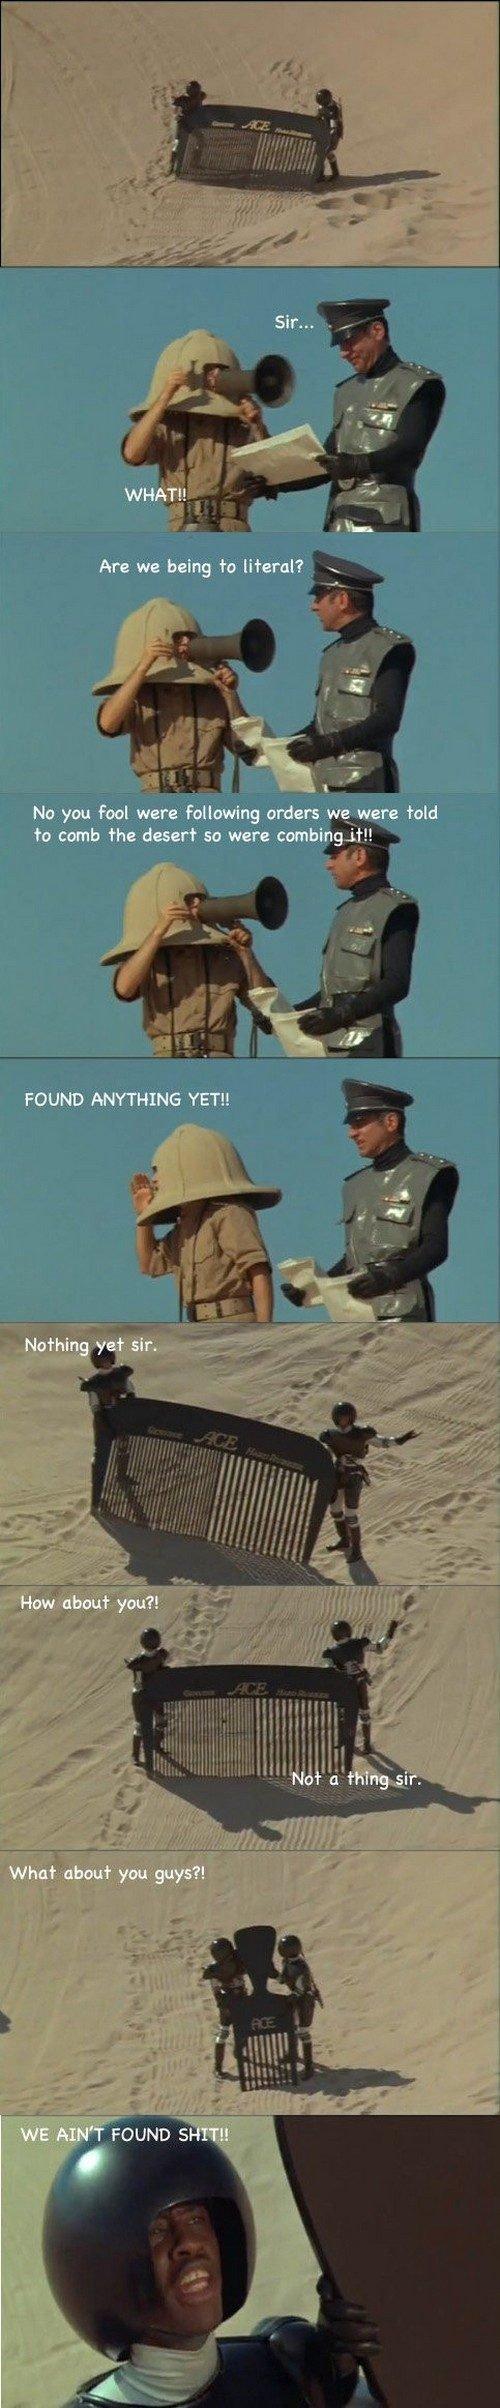 Go Comb The Desert